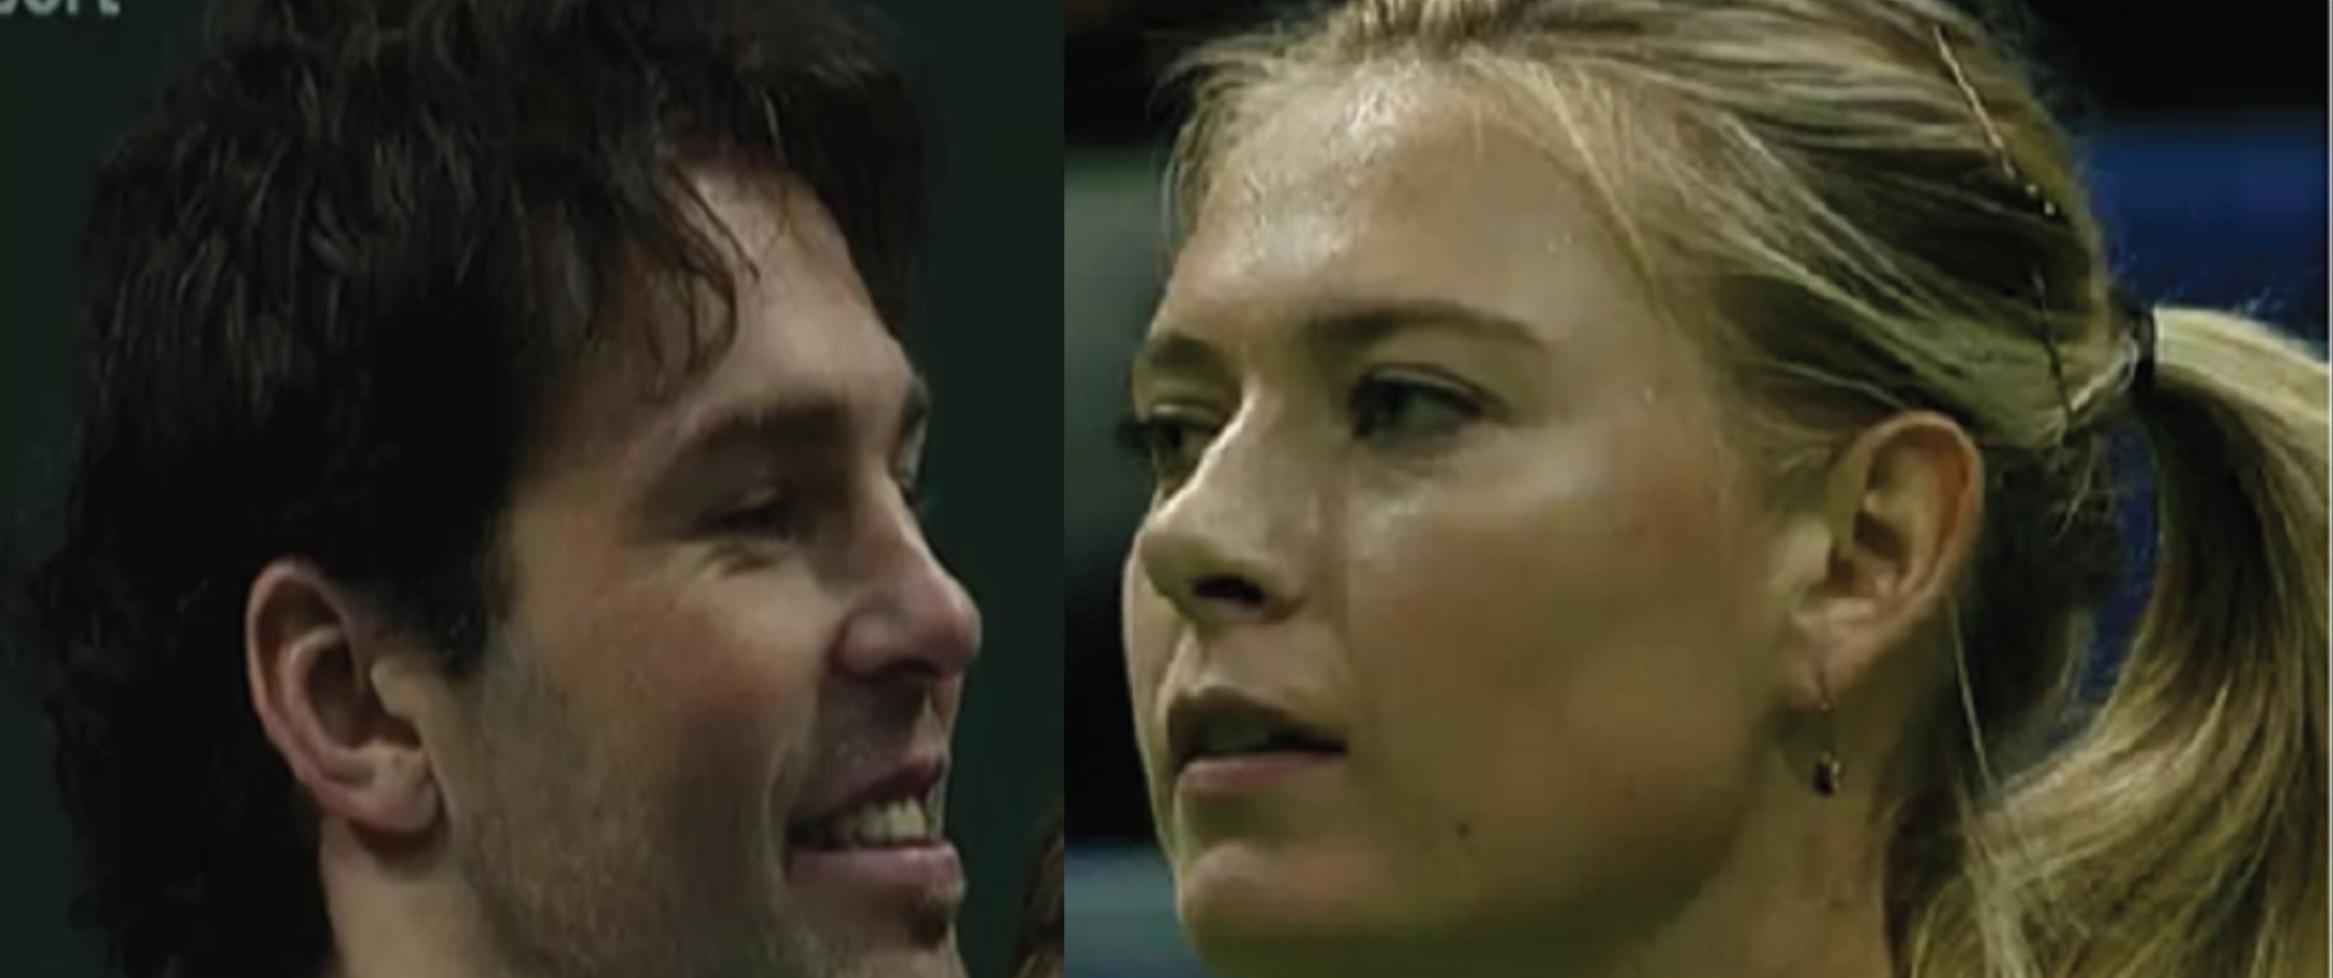 Jagr flirted with Sharapova